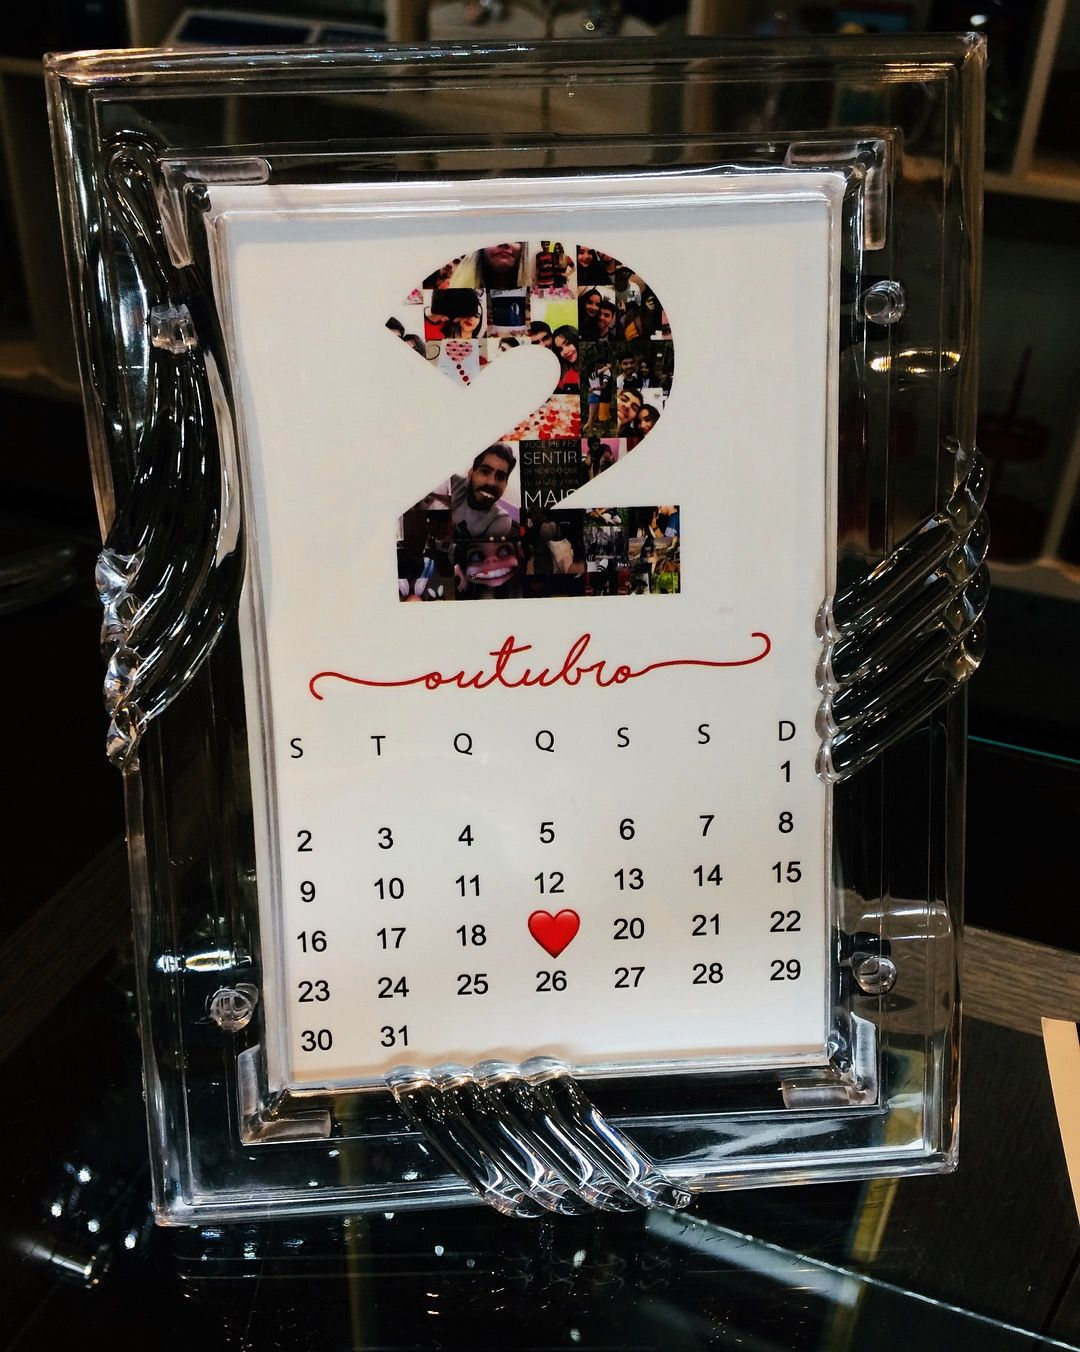 Calendario Romantico Simbolizando 2 Anos De Namoro No Dia 19 De